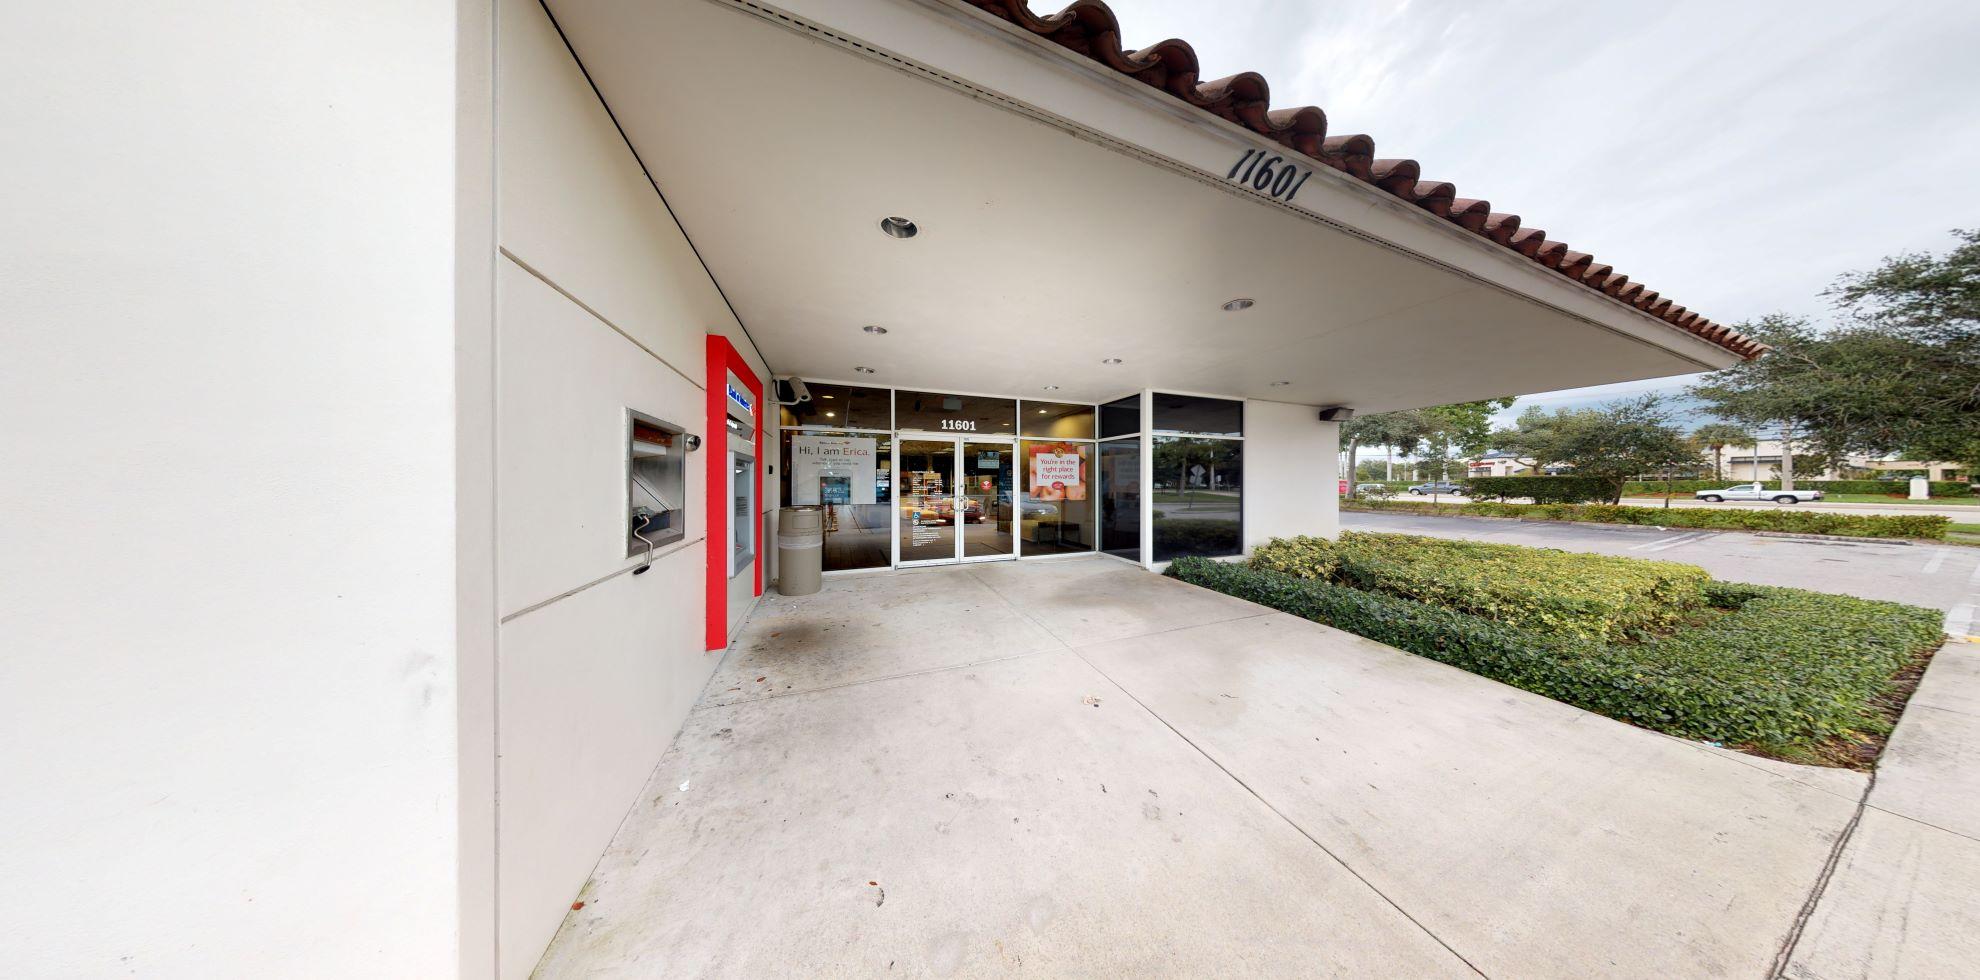 Bank of America financial center with drive-thru ATM | 11601 Okeechobee Blvd, Royal Palm Beach, FL 33411